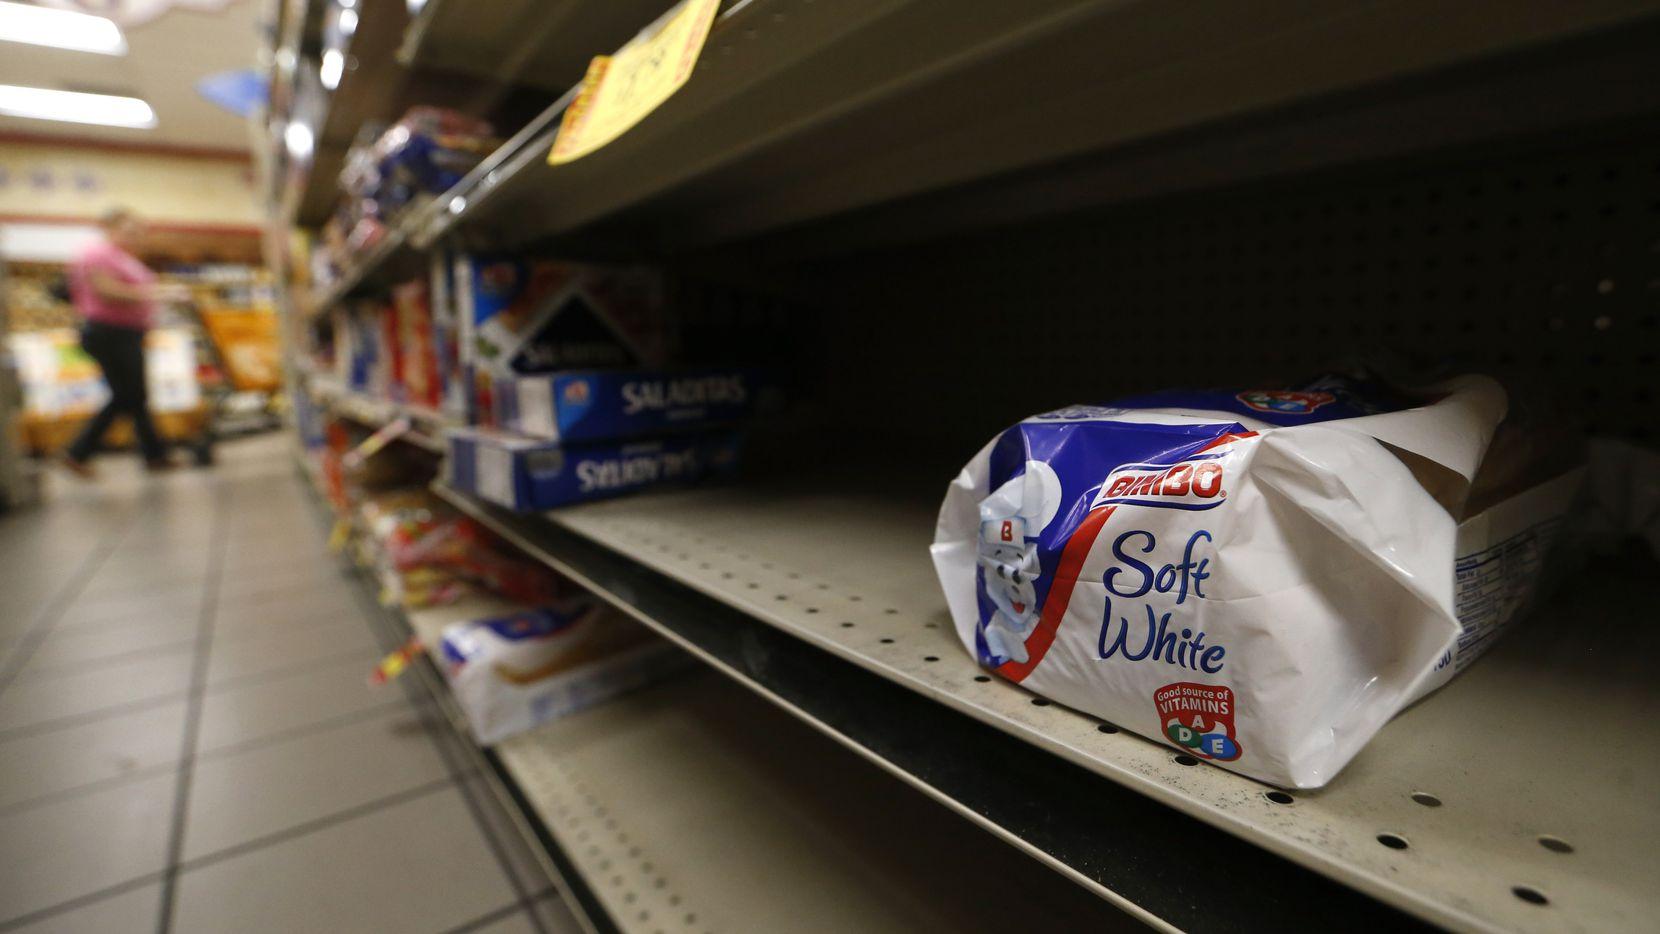 Bread was in short supply at La Michoacana Meat Market near the BIshop Arts District in north Oak Cliff on Saturday.